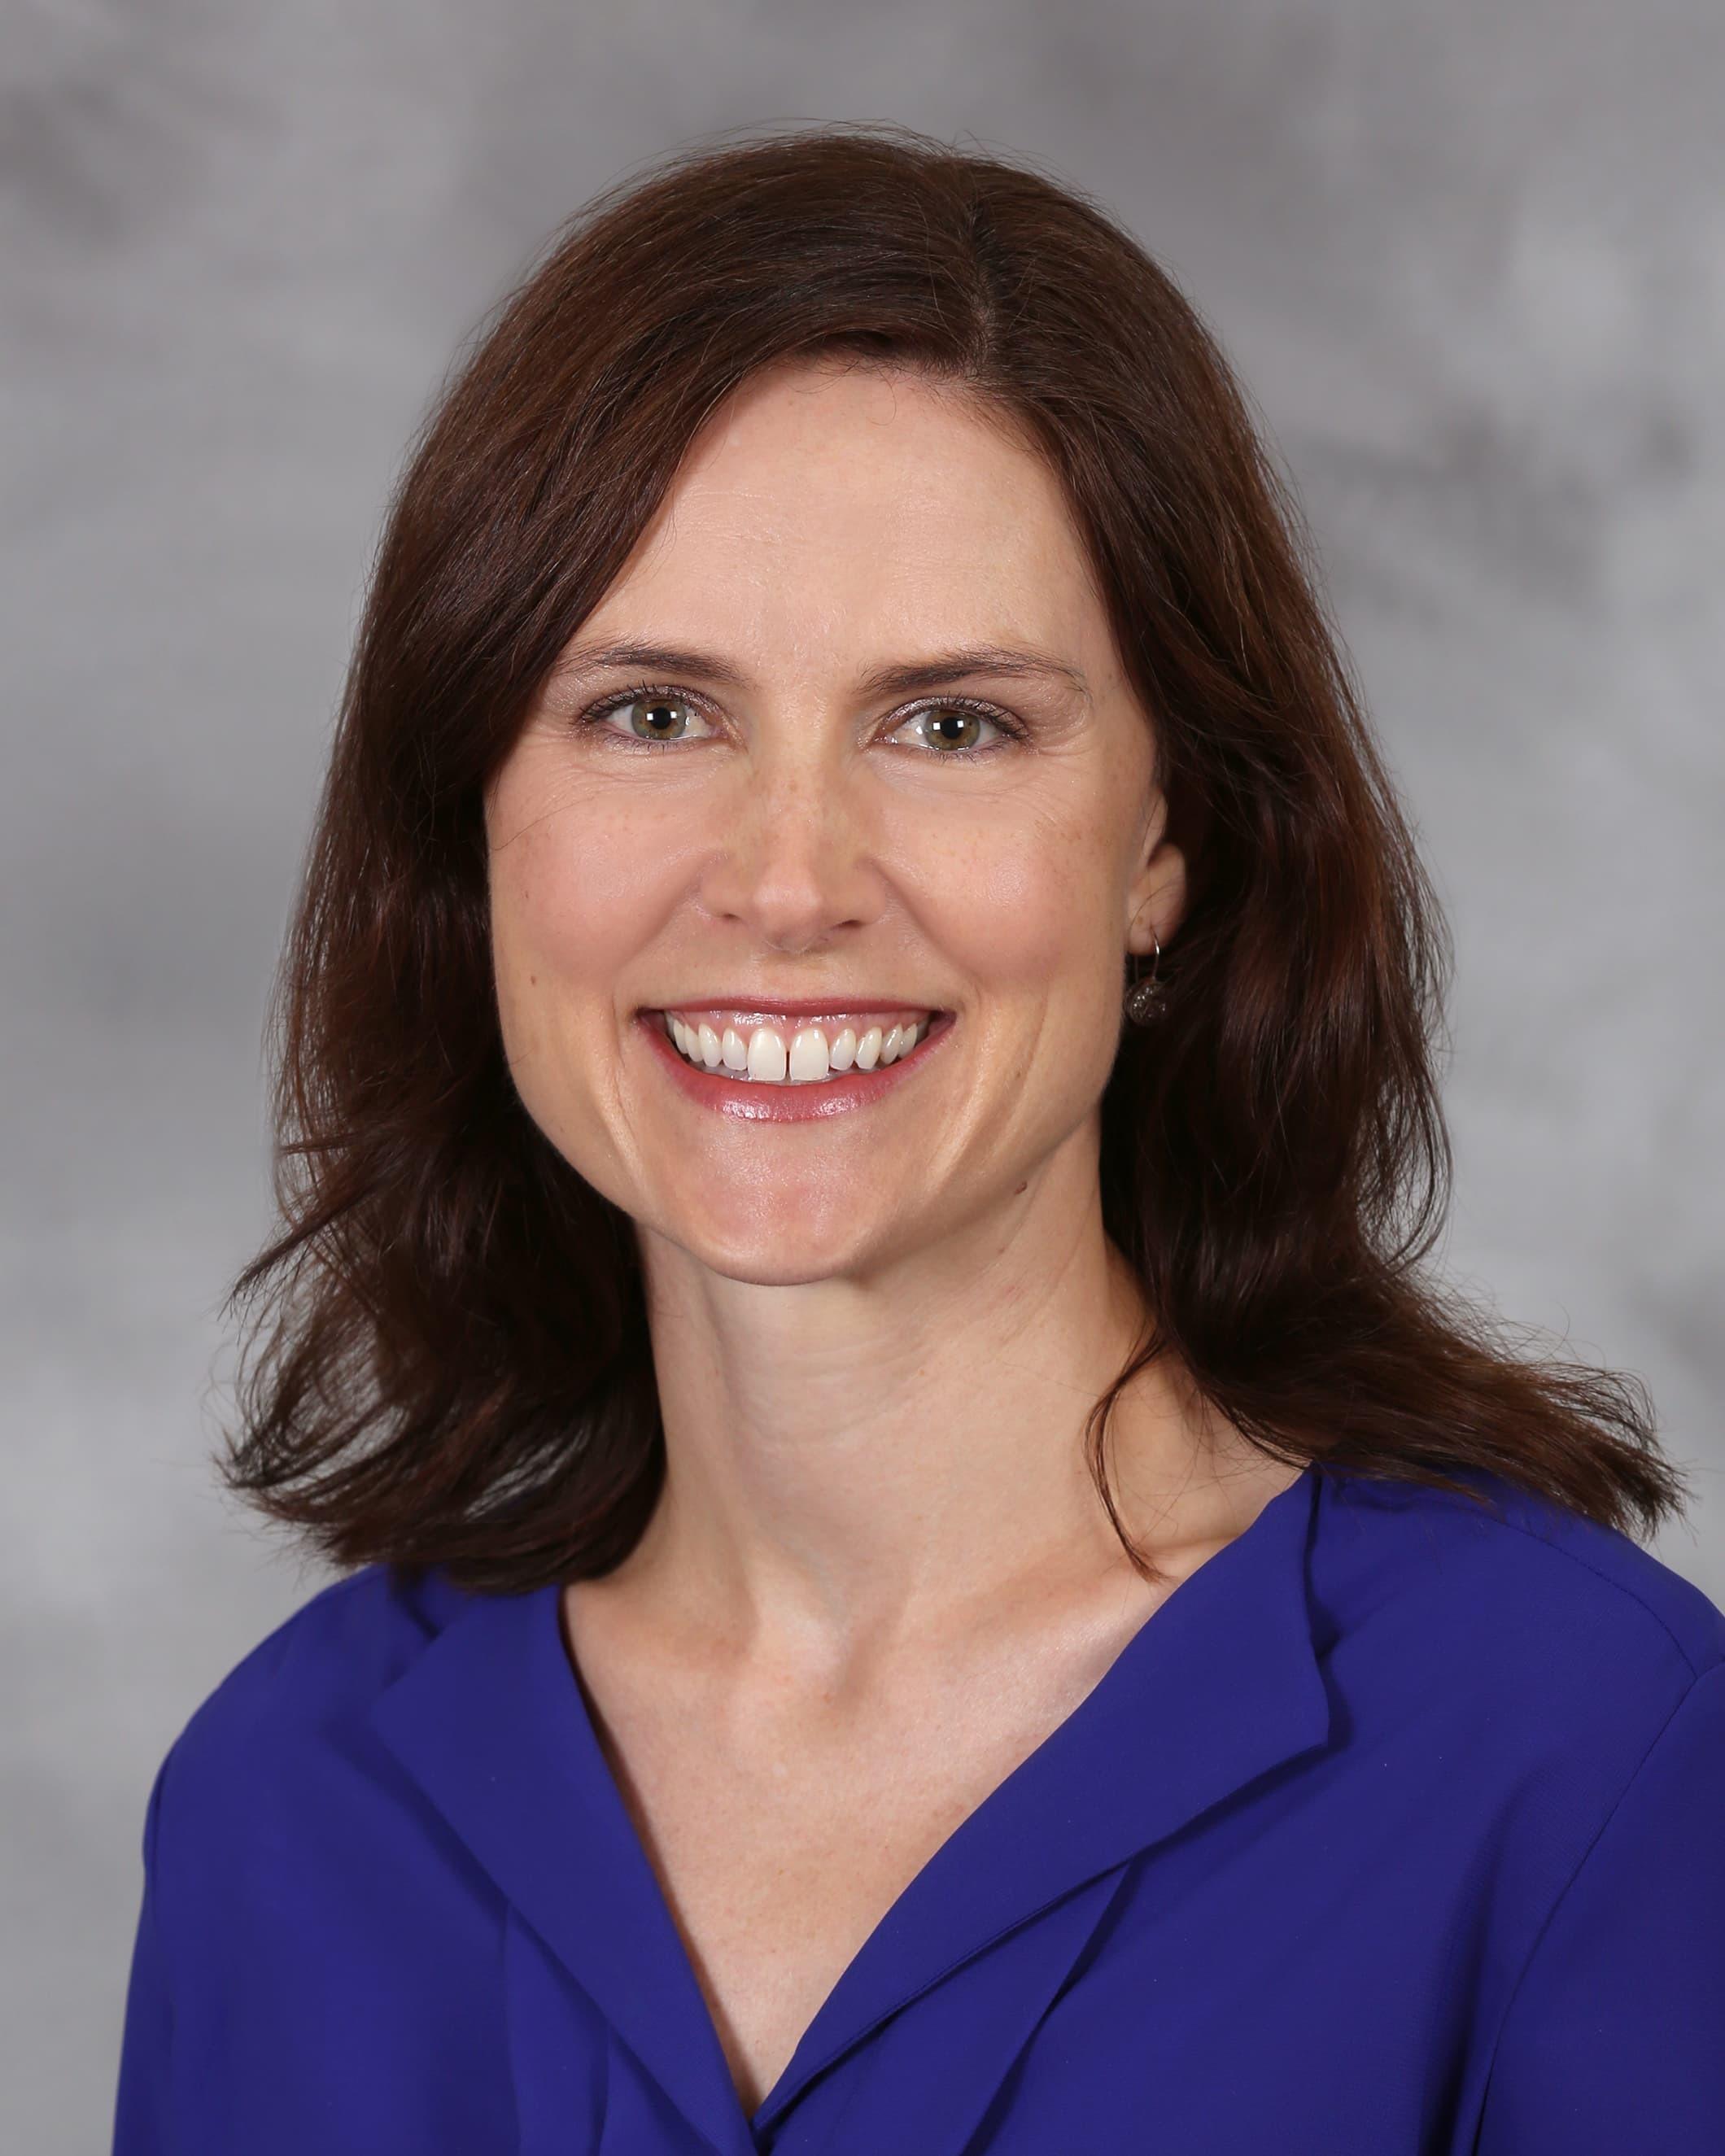 Kathleen M Swec, MD